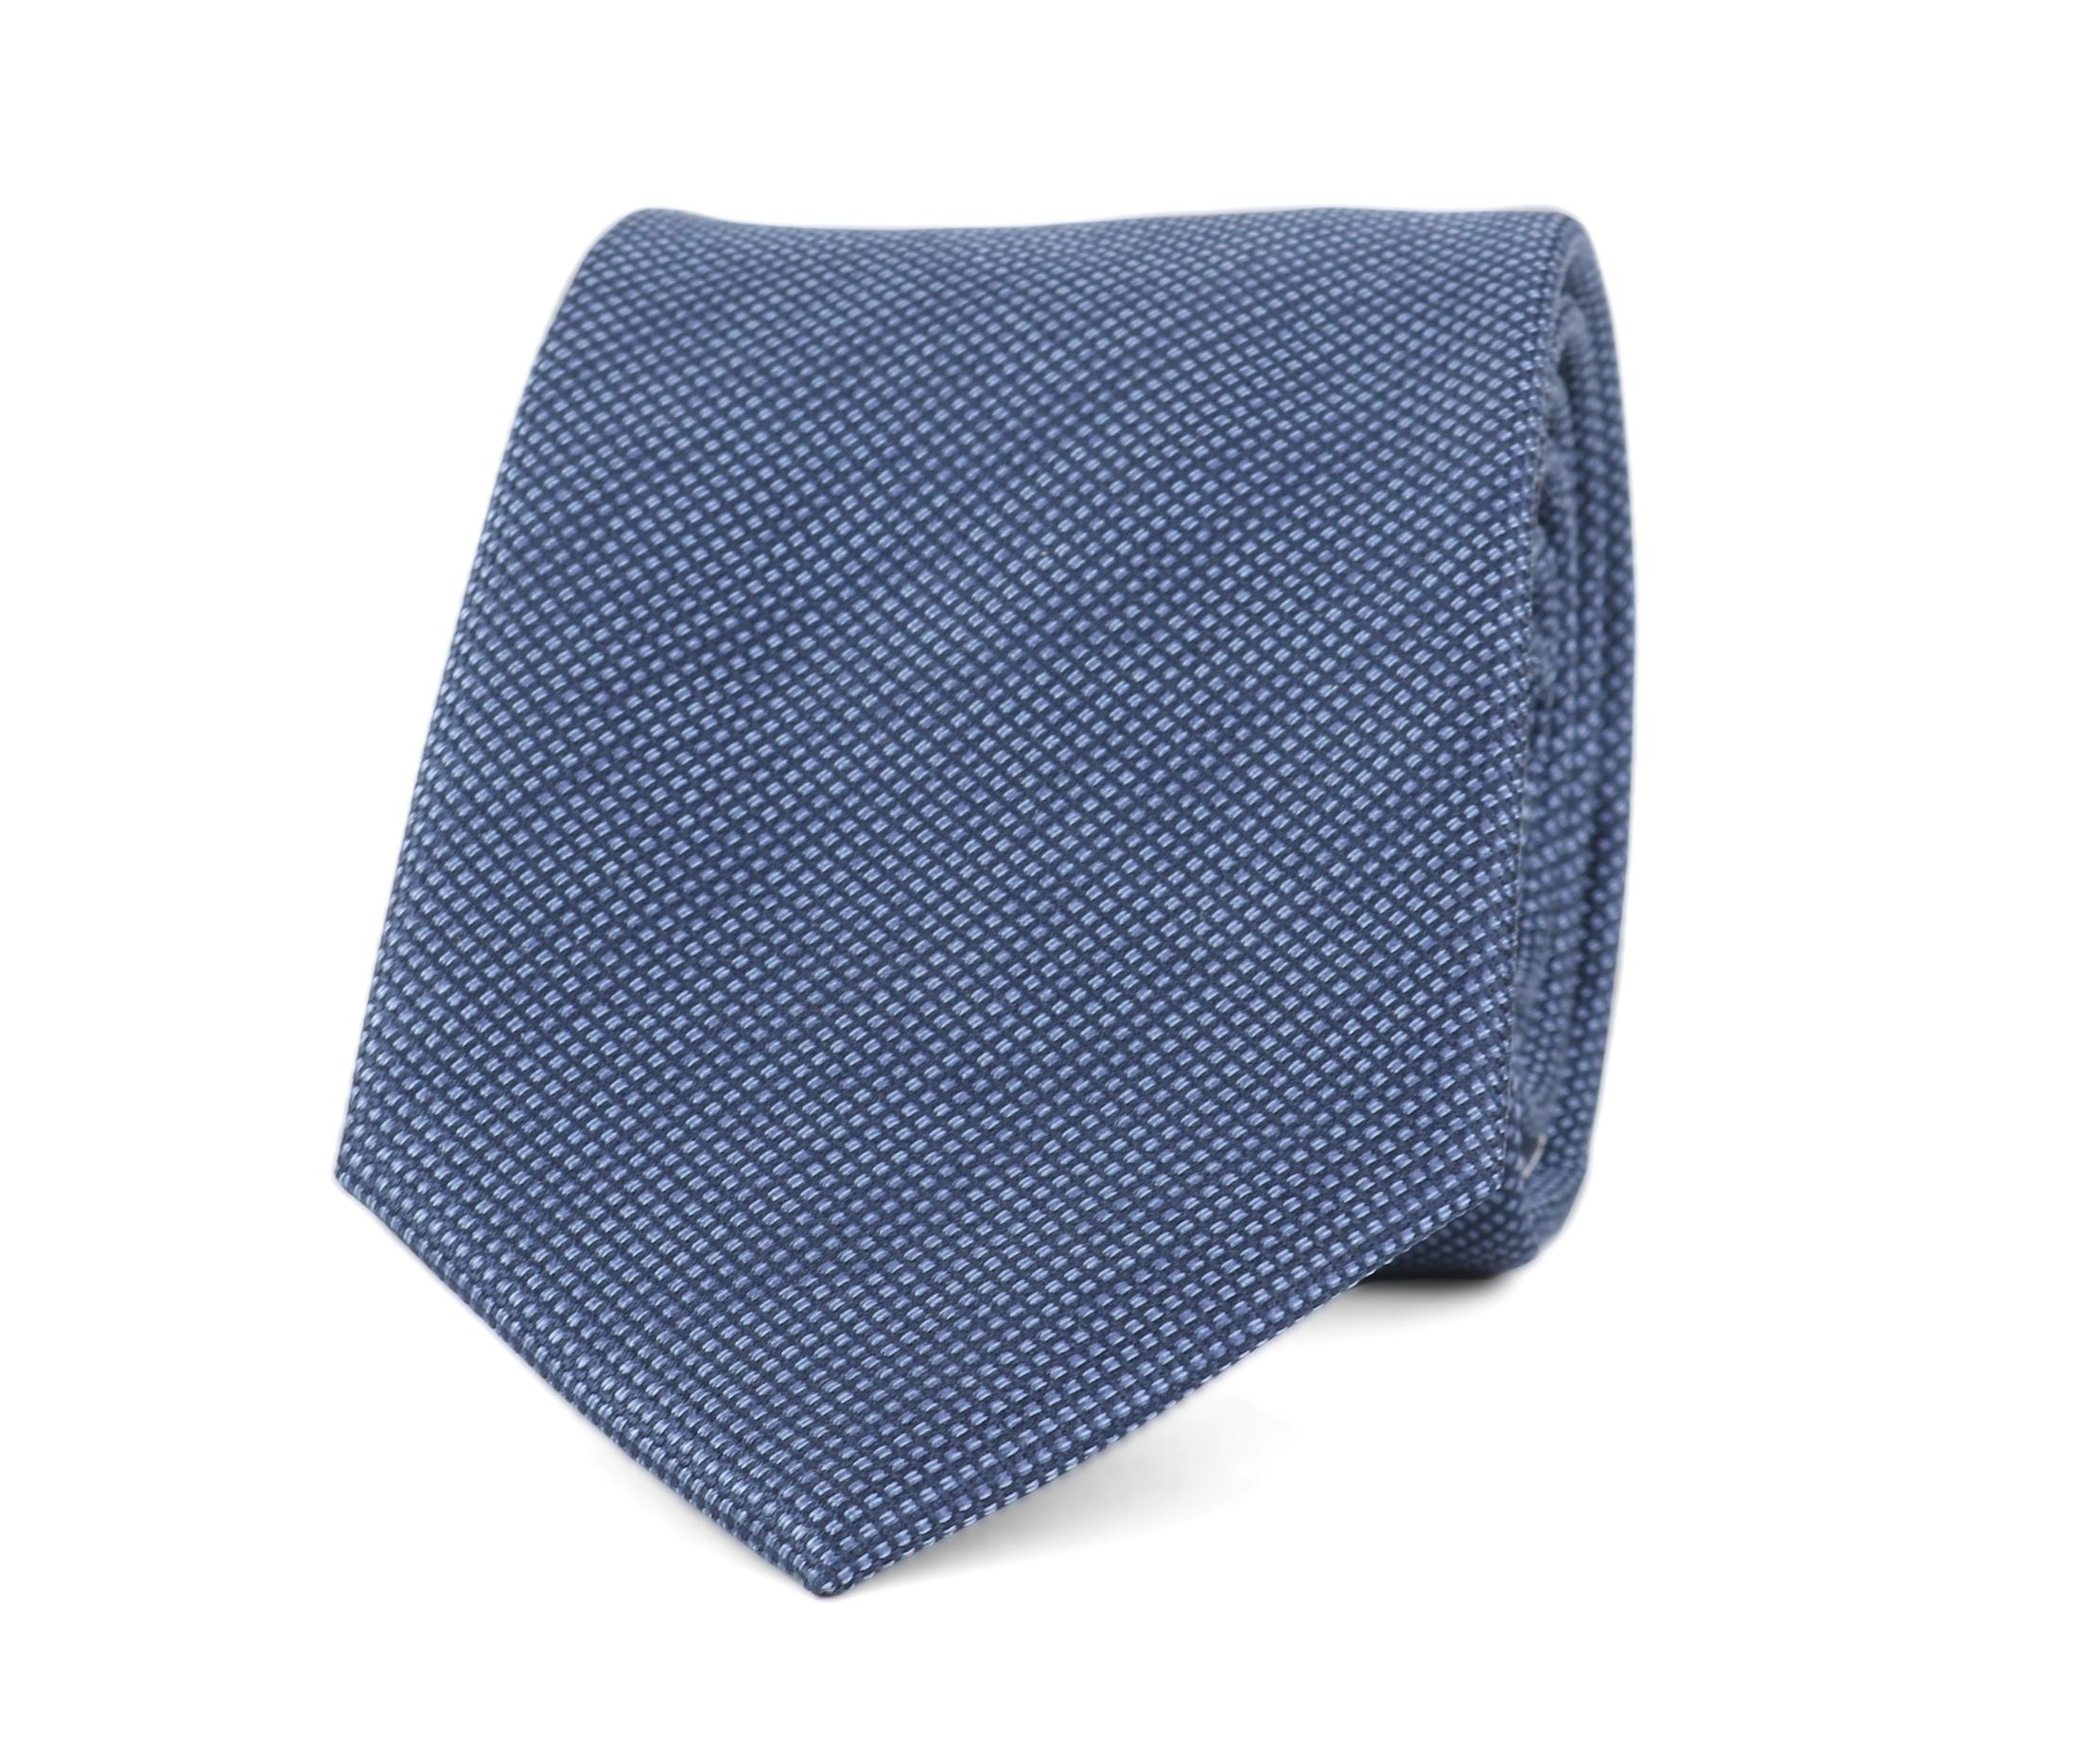 Krawatte Seide Pinpoint Dunkeblau 9-17 foto 0